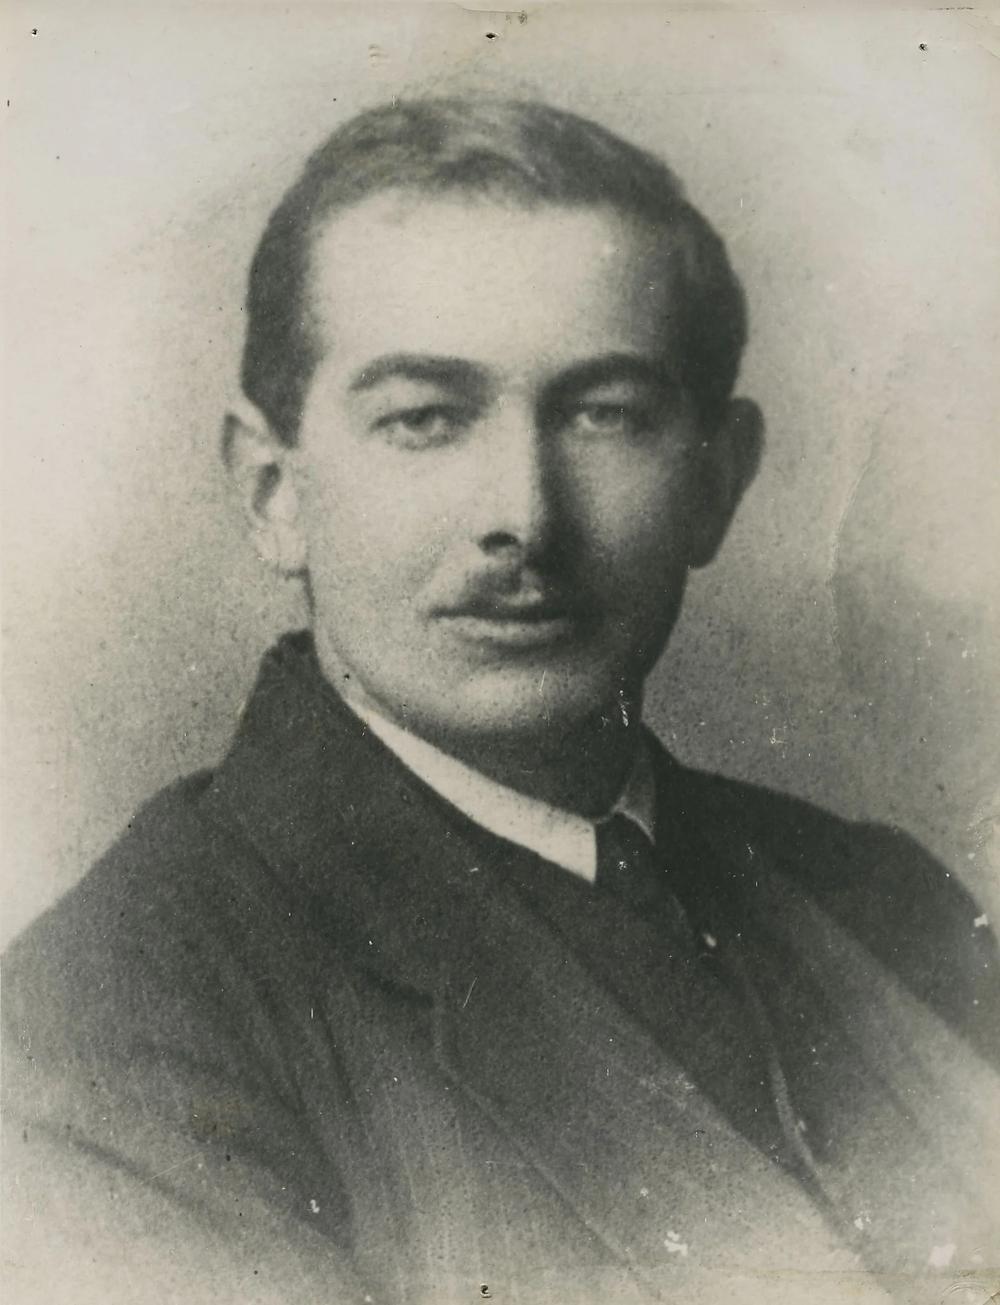 Black and white image of Irish revolutionary leader Seán Treacy